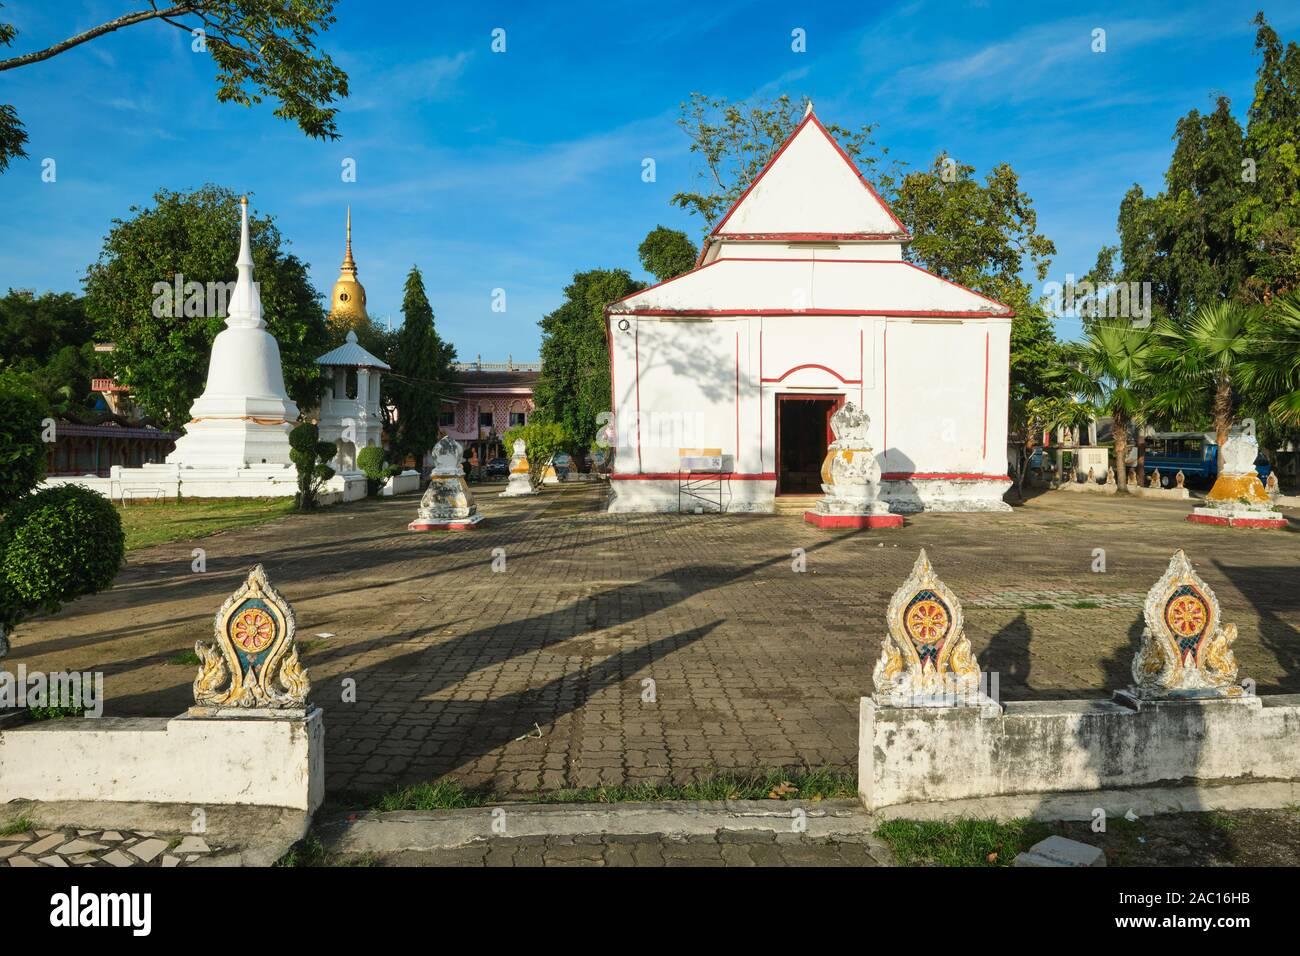 The old Bot or Ubosot (ordination hall) of Wat Phra Nang Sang, Thalang, Phuket, Thailand, a chedi (stupa) on the left, sema (marker) stones in front Stock Photo